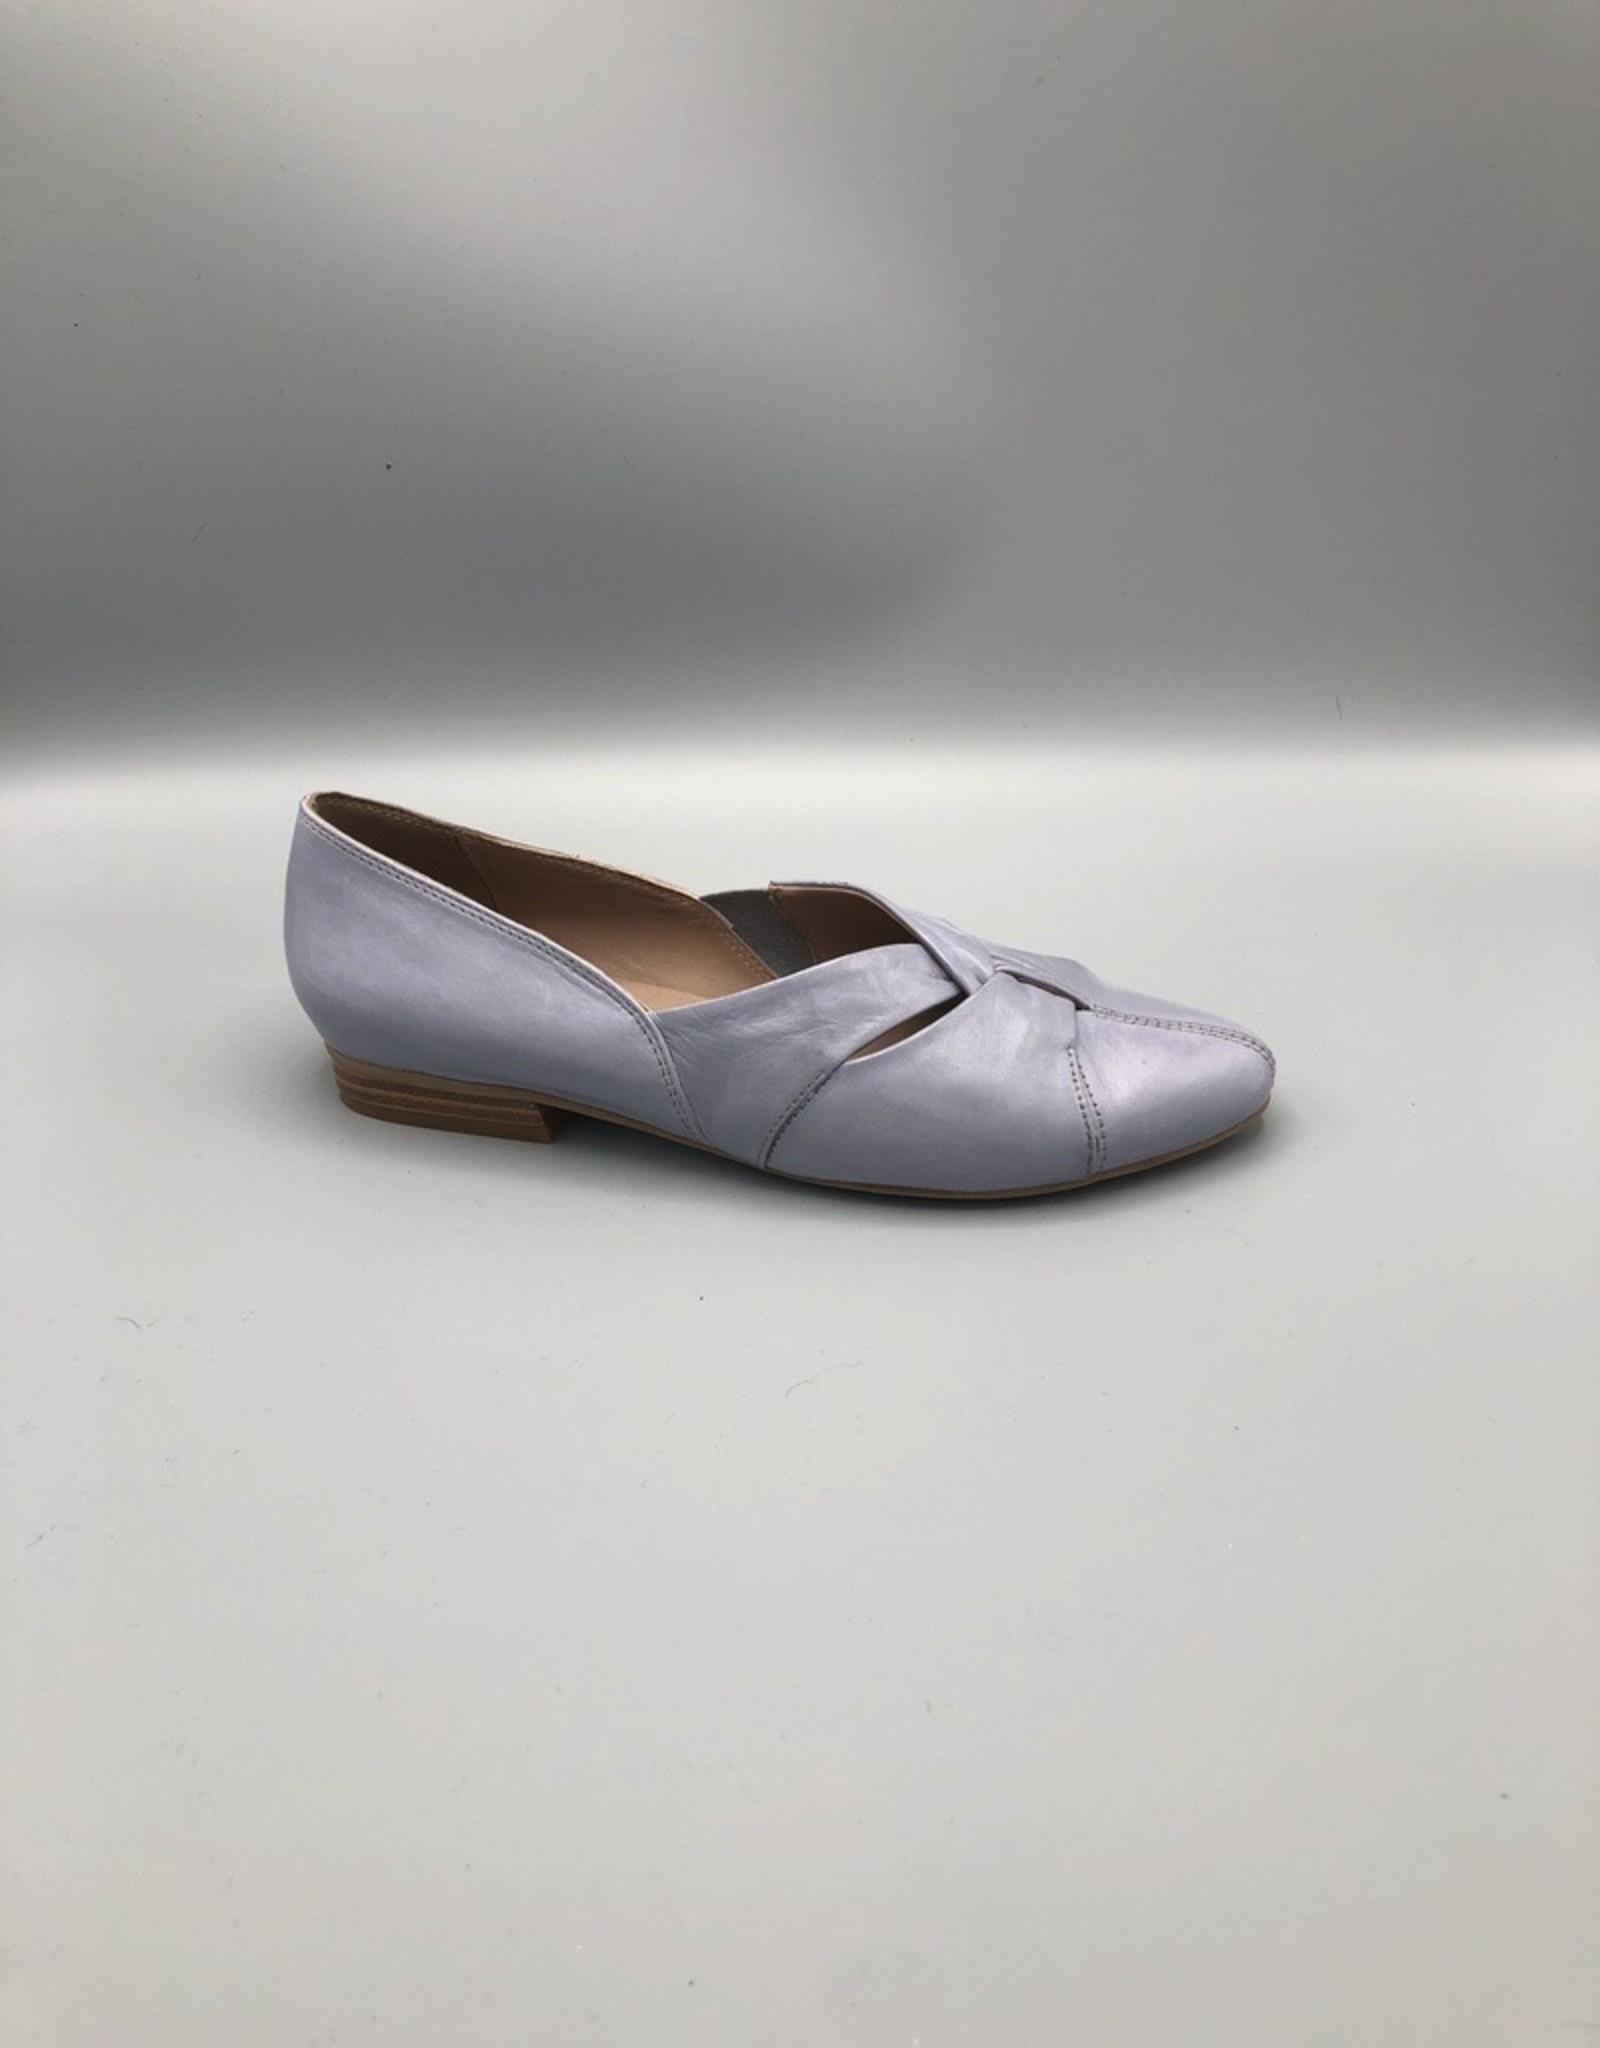 Canal Grande Belinda Braided Leather Pointed Toe Shoe